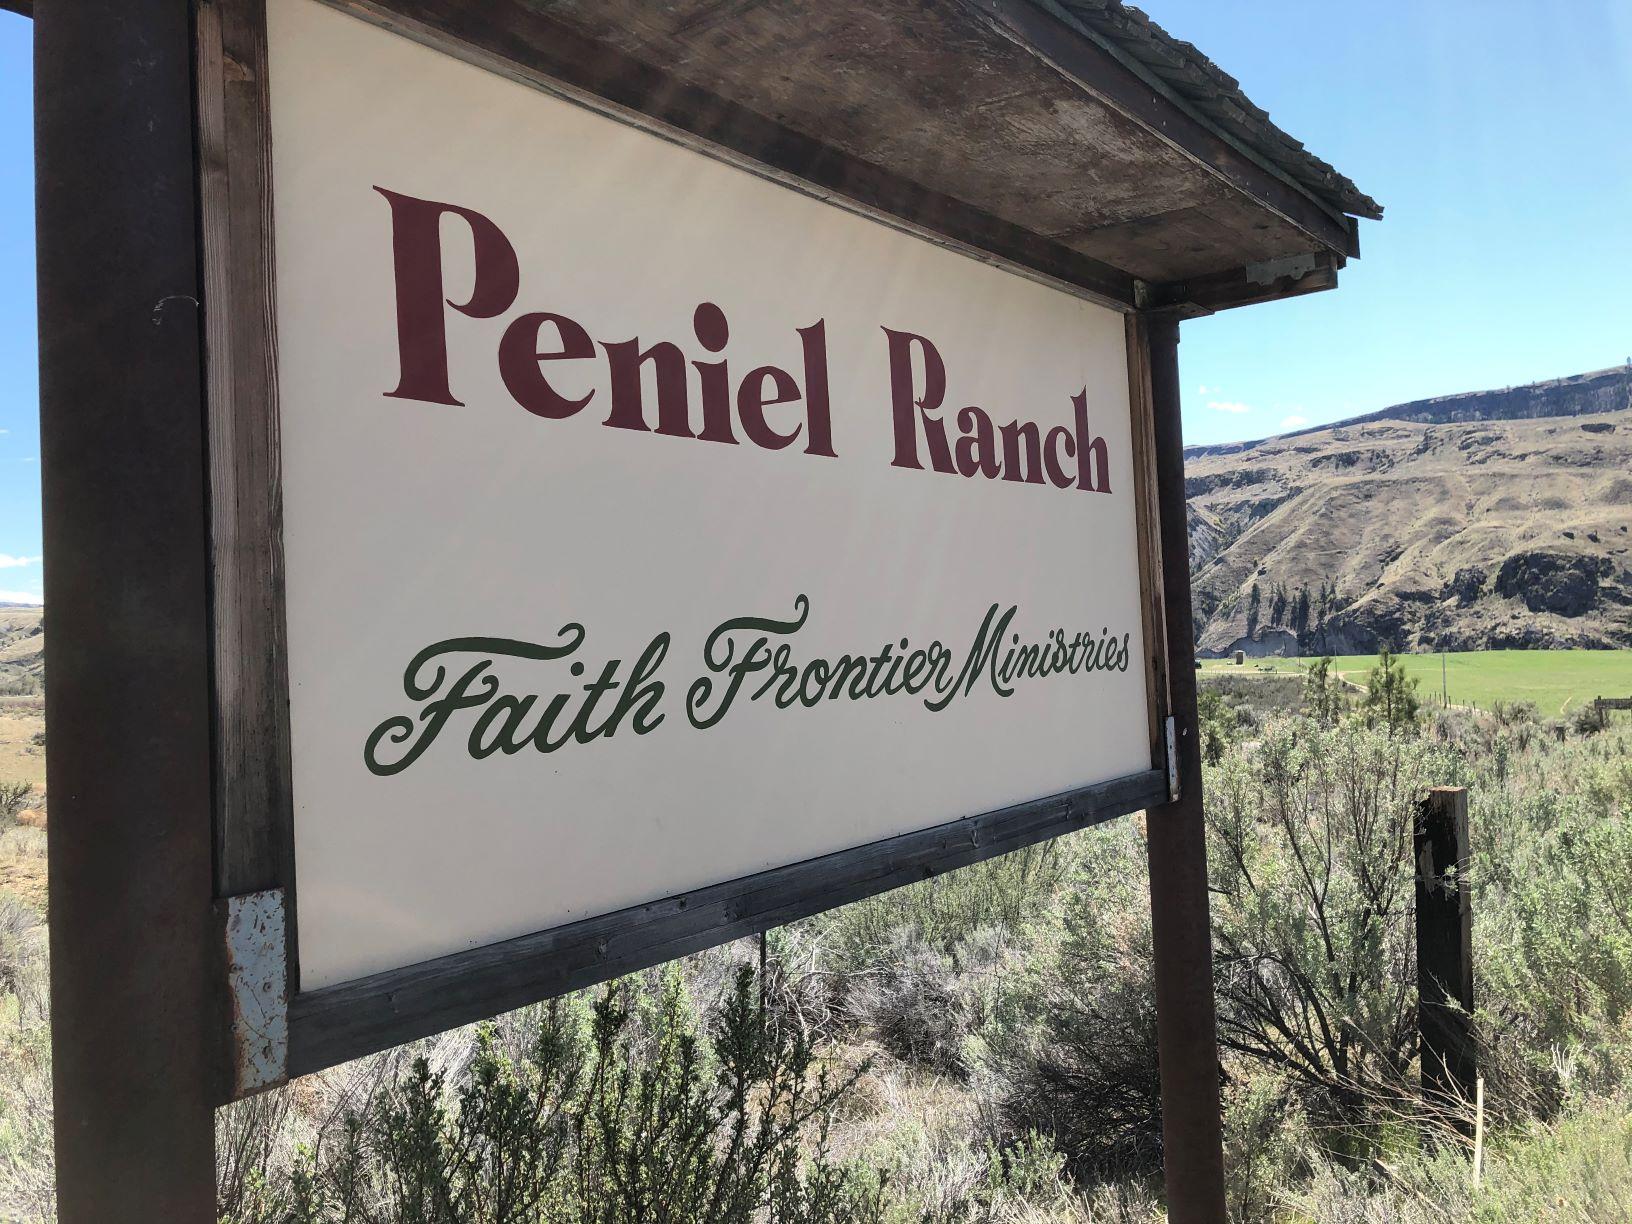 Peniel Ranch sign